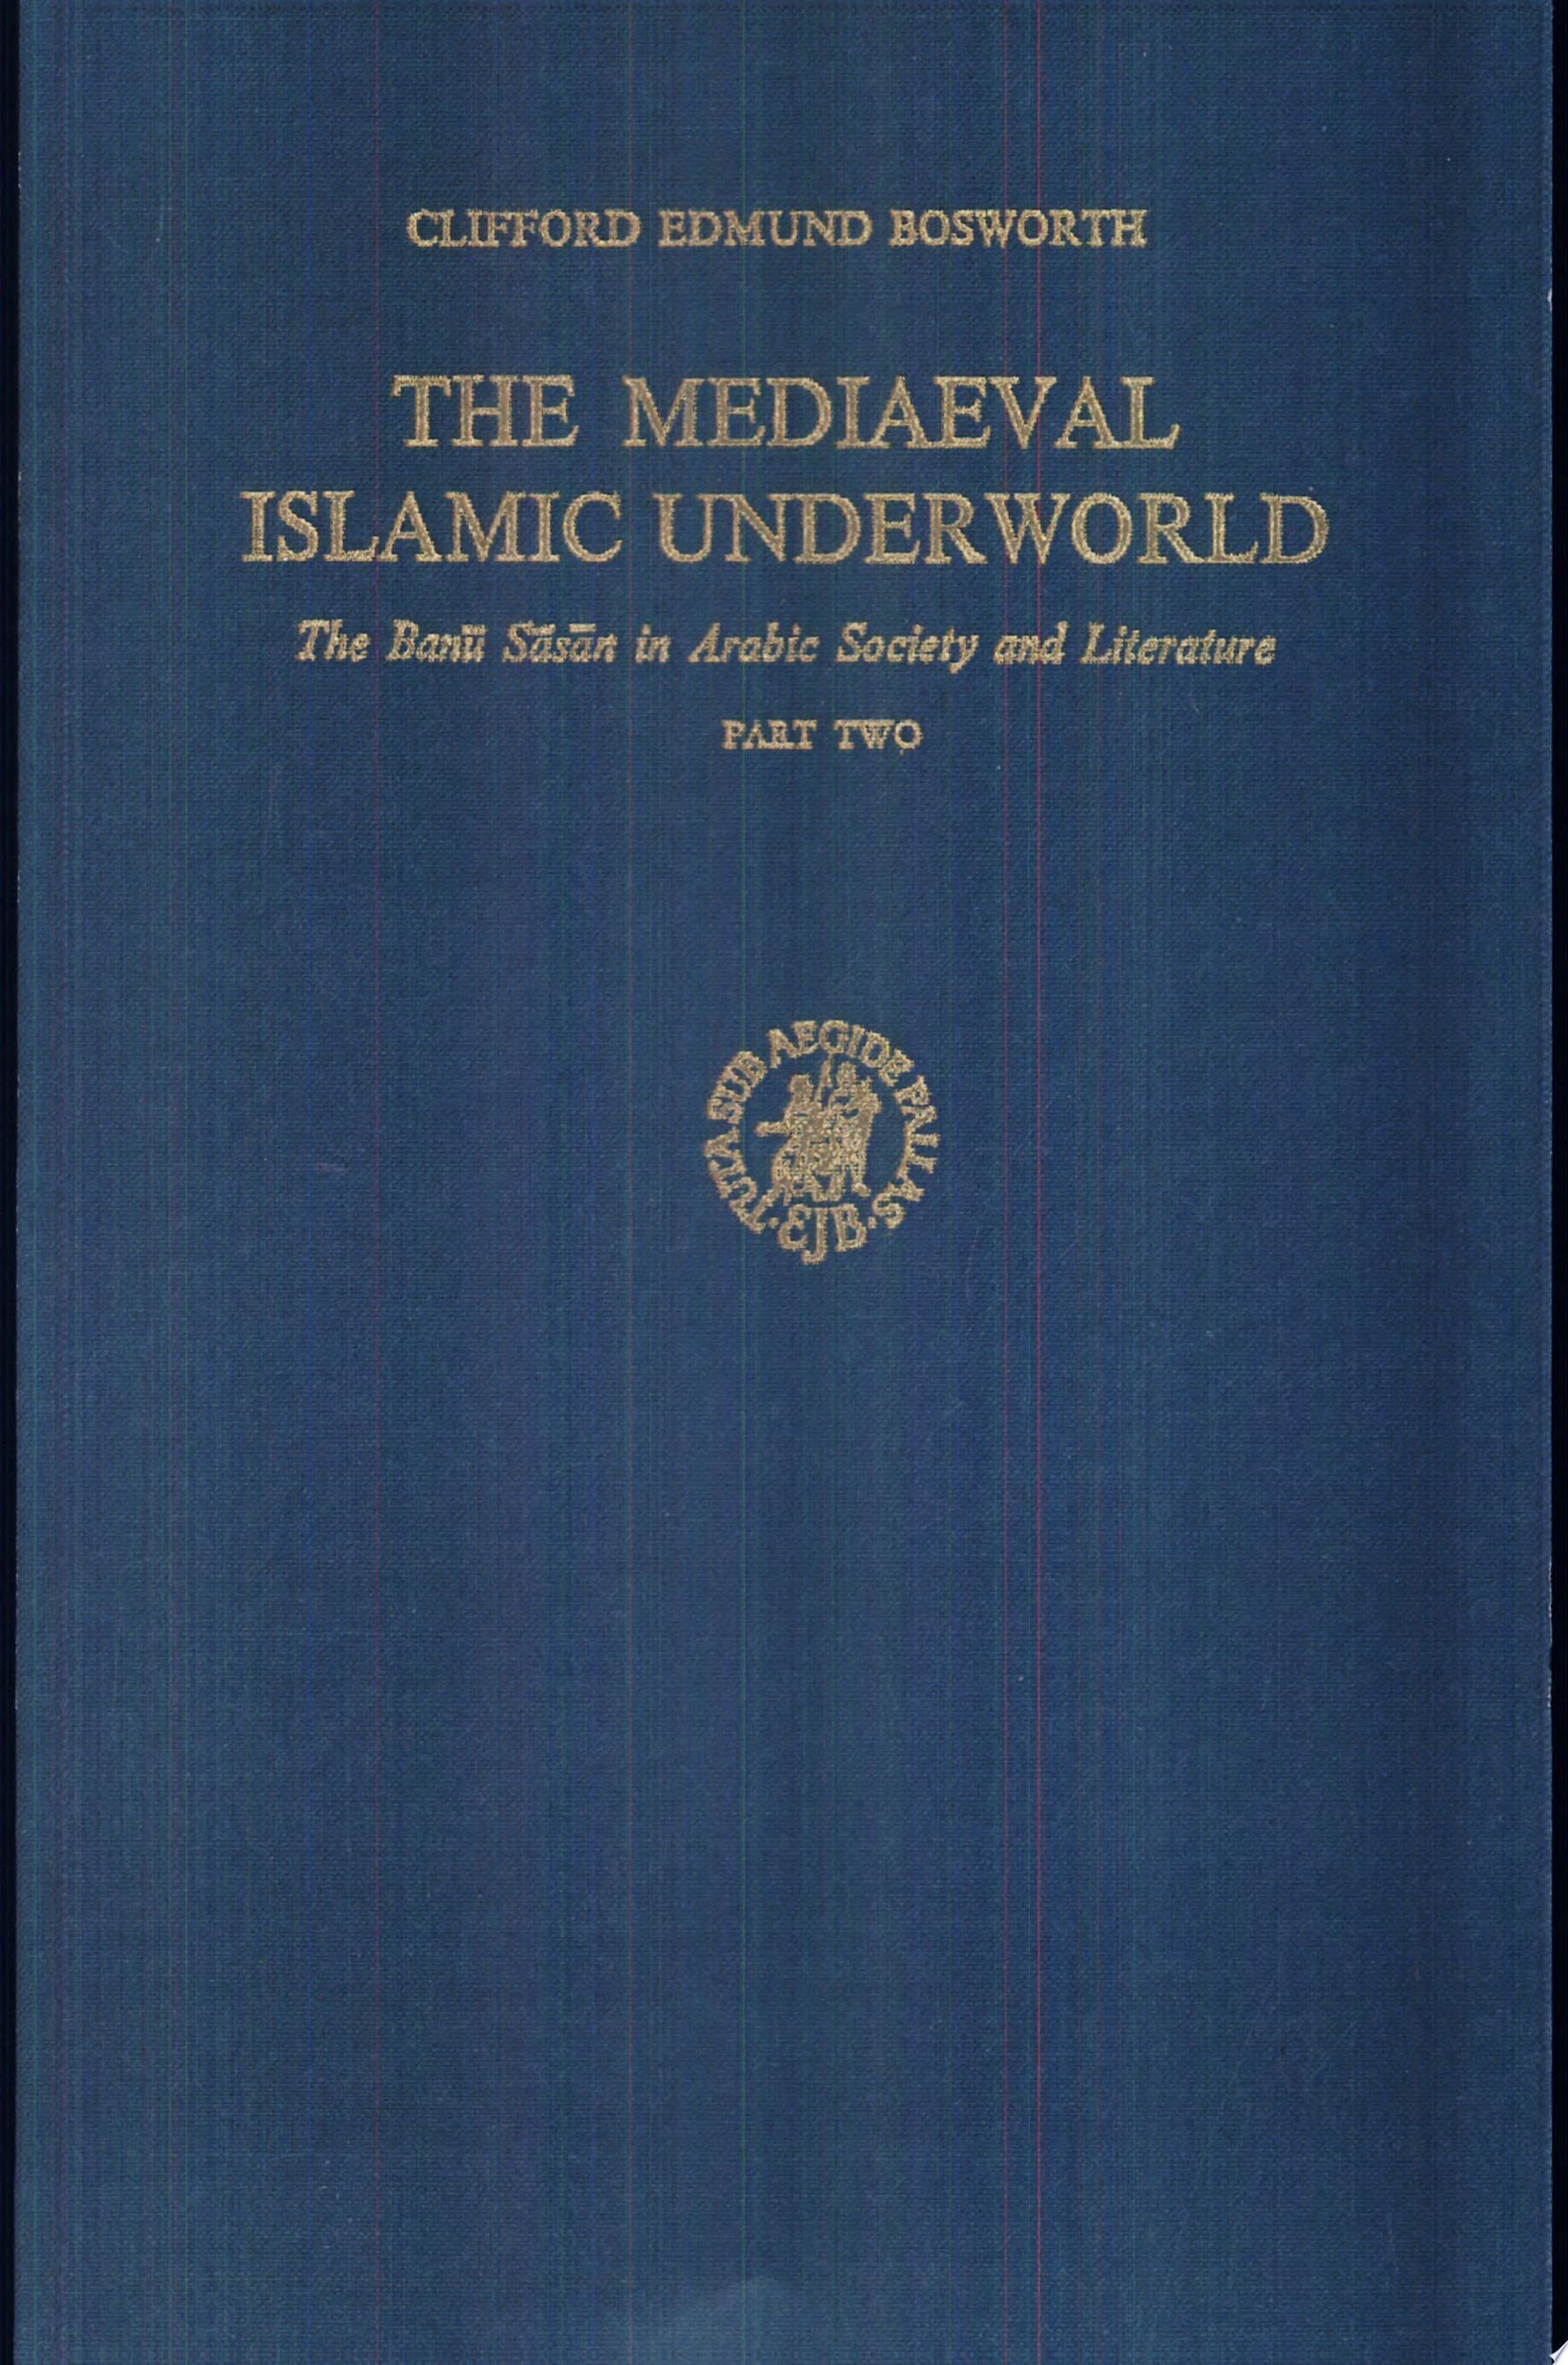 The mediaeval islamic underworld